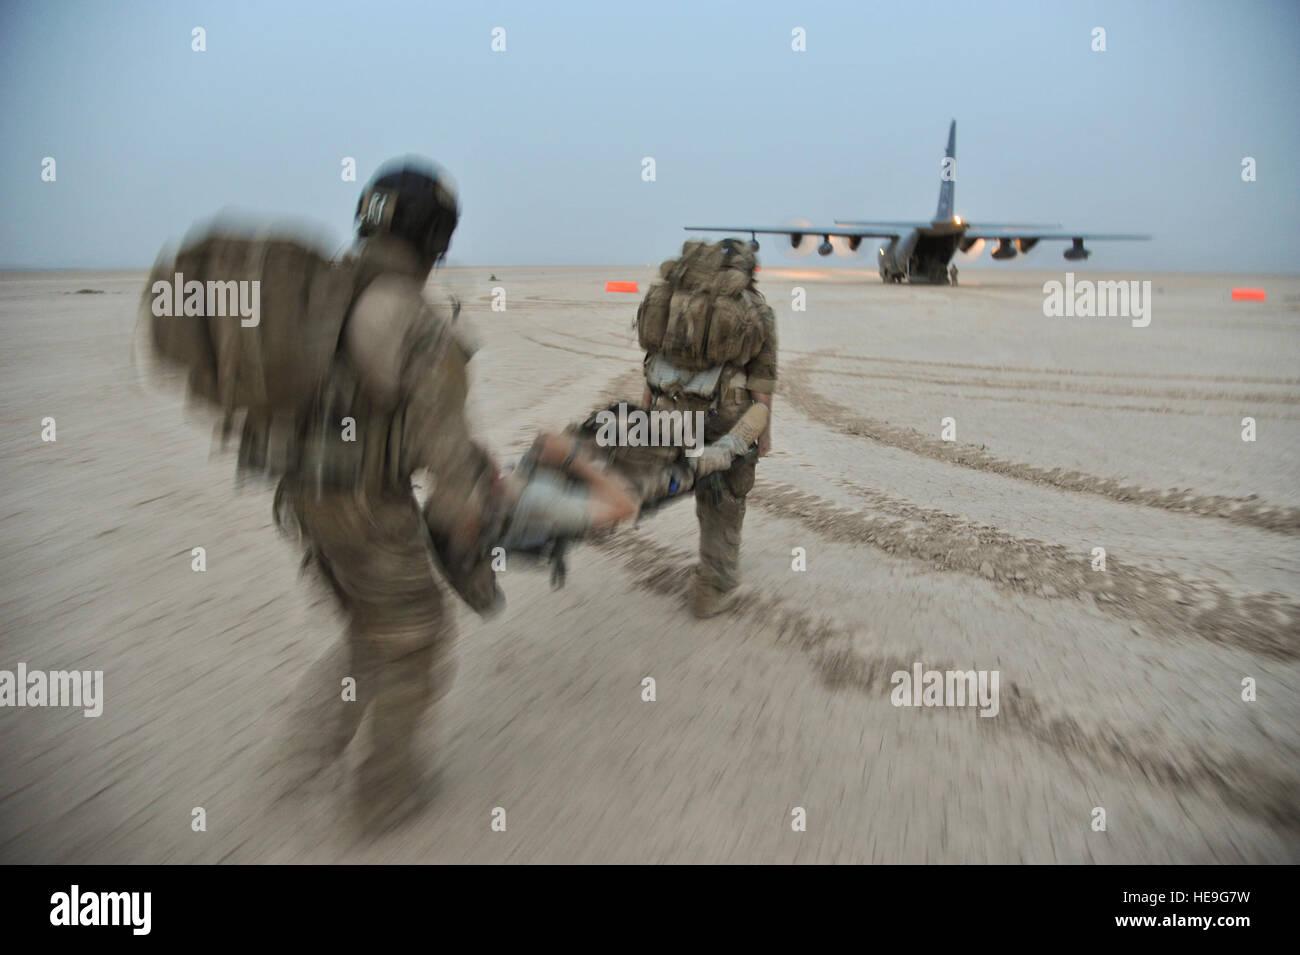 U S  Air Force pararescuemen cross-load simulated casualties